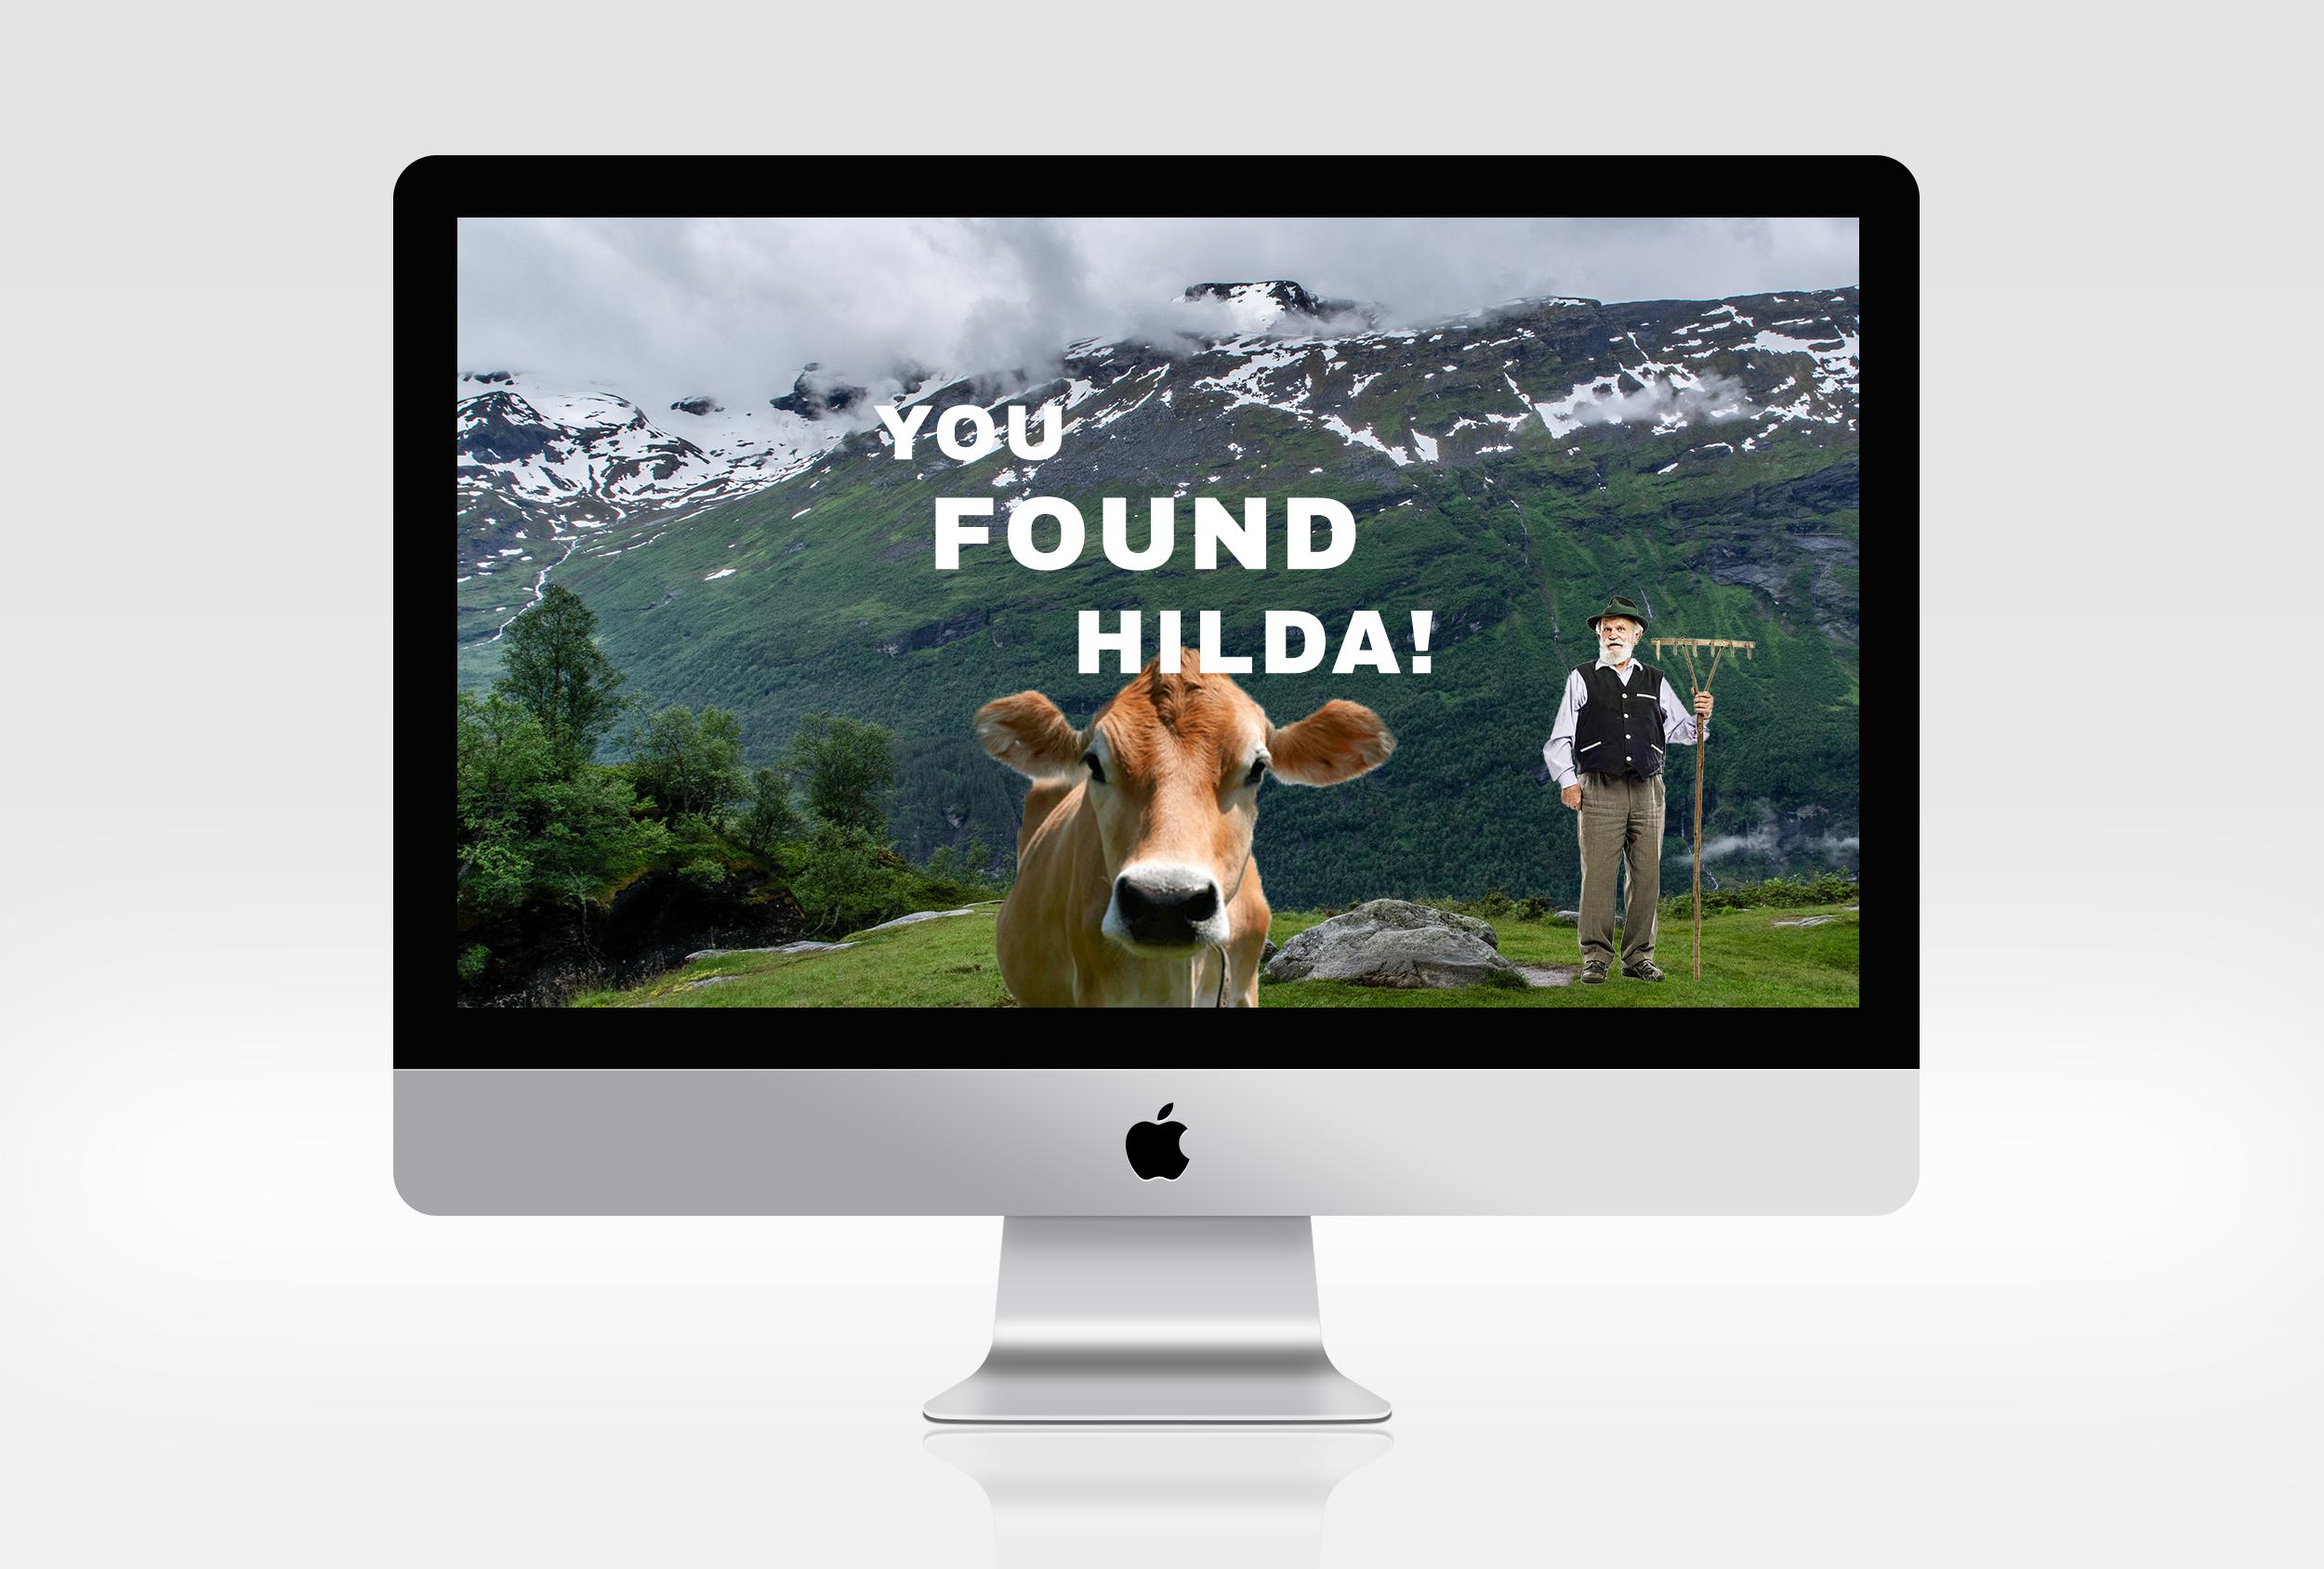 iMac-psd-mockup-template-11.png